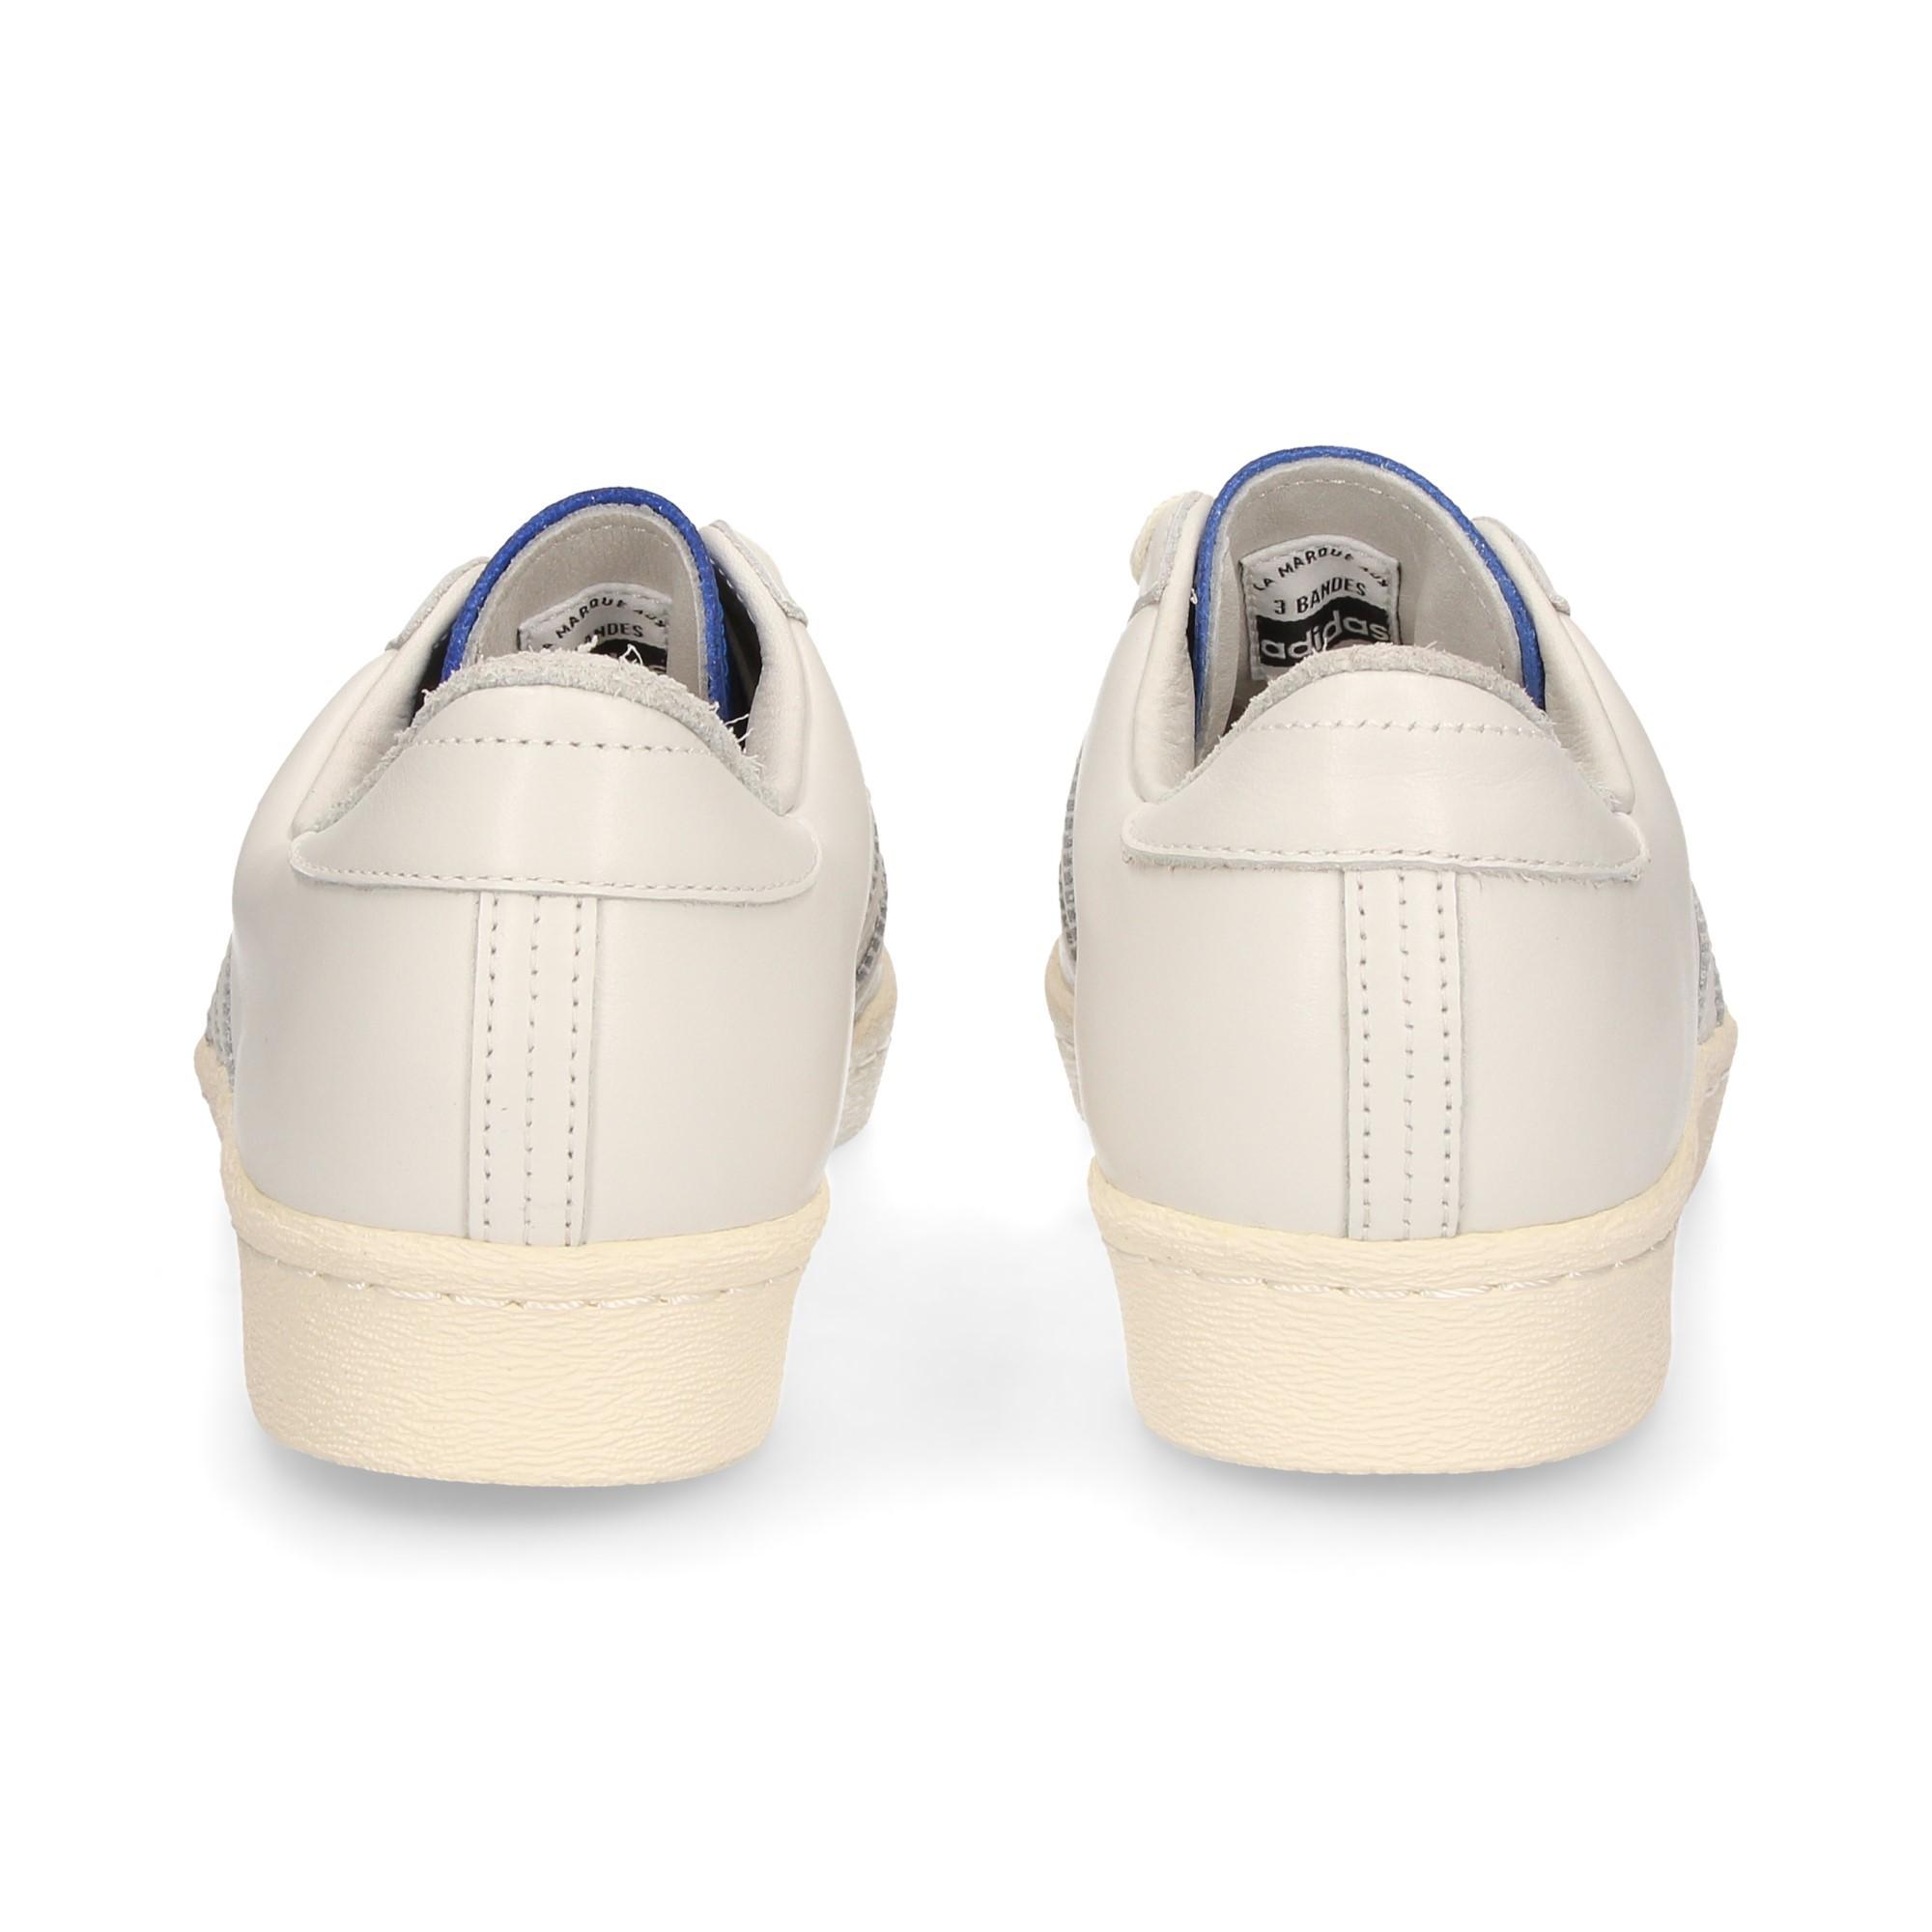 blue-lengueta-3-stripes-white-skin